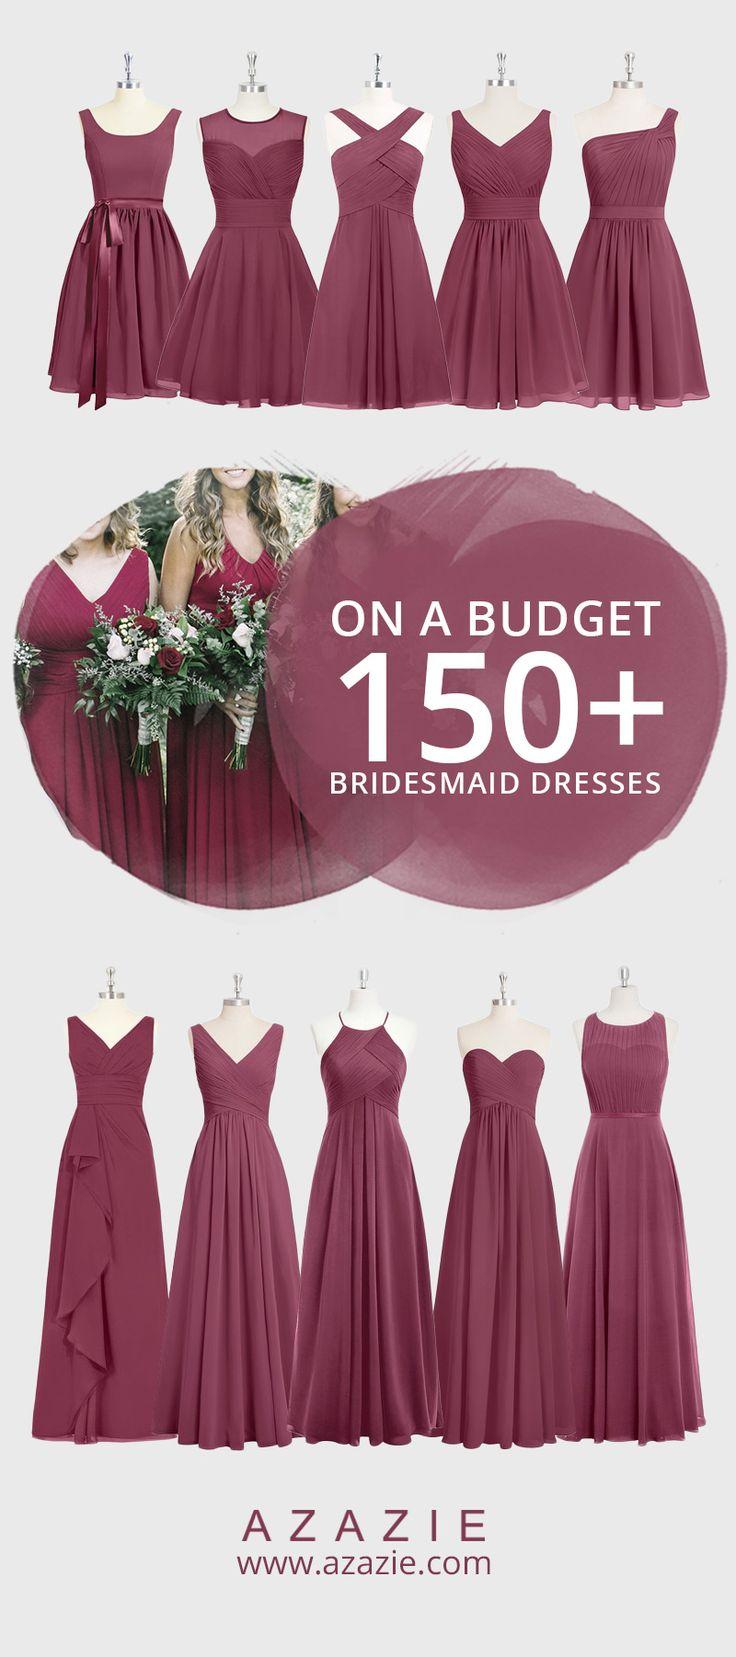 728 best Wedding images on Pinterest | Engagements, Engagement rings ...